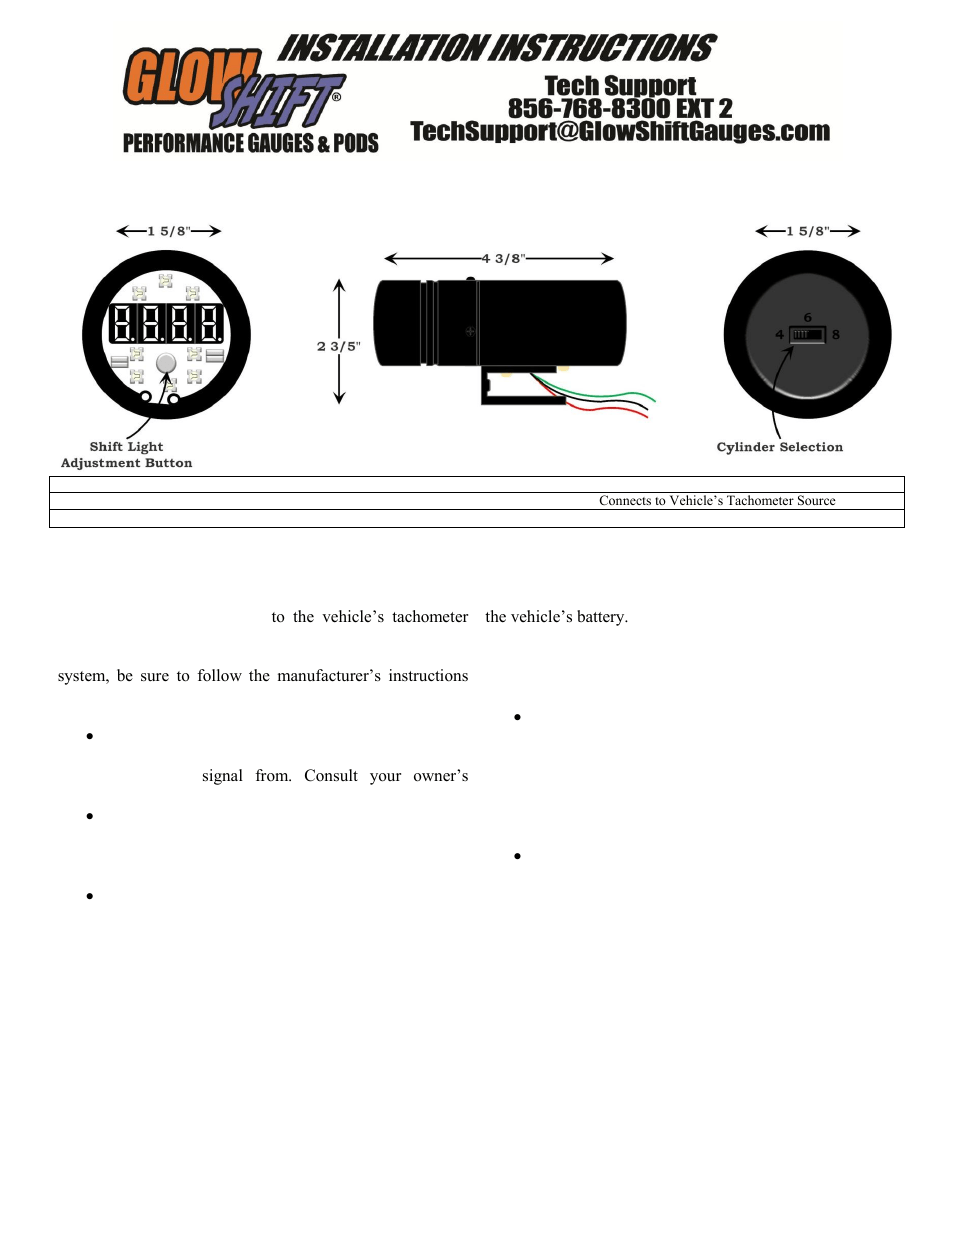 medium resolution of glowshift digital tachometer w shift light user manual 2 pages also for digital tachometer